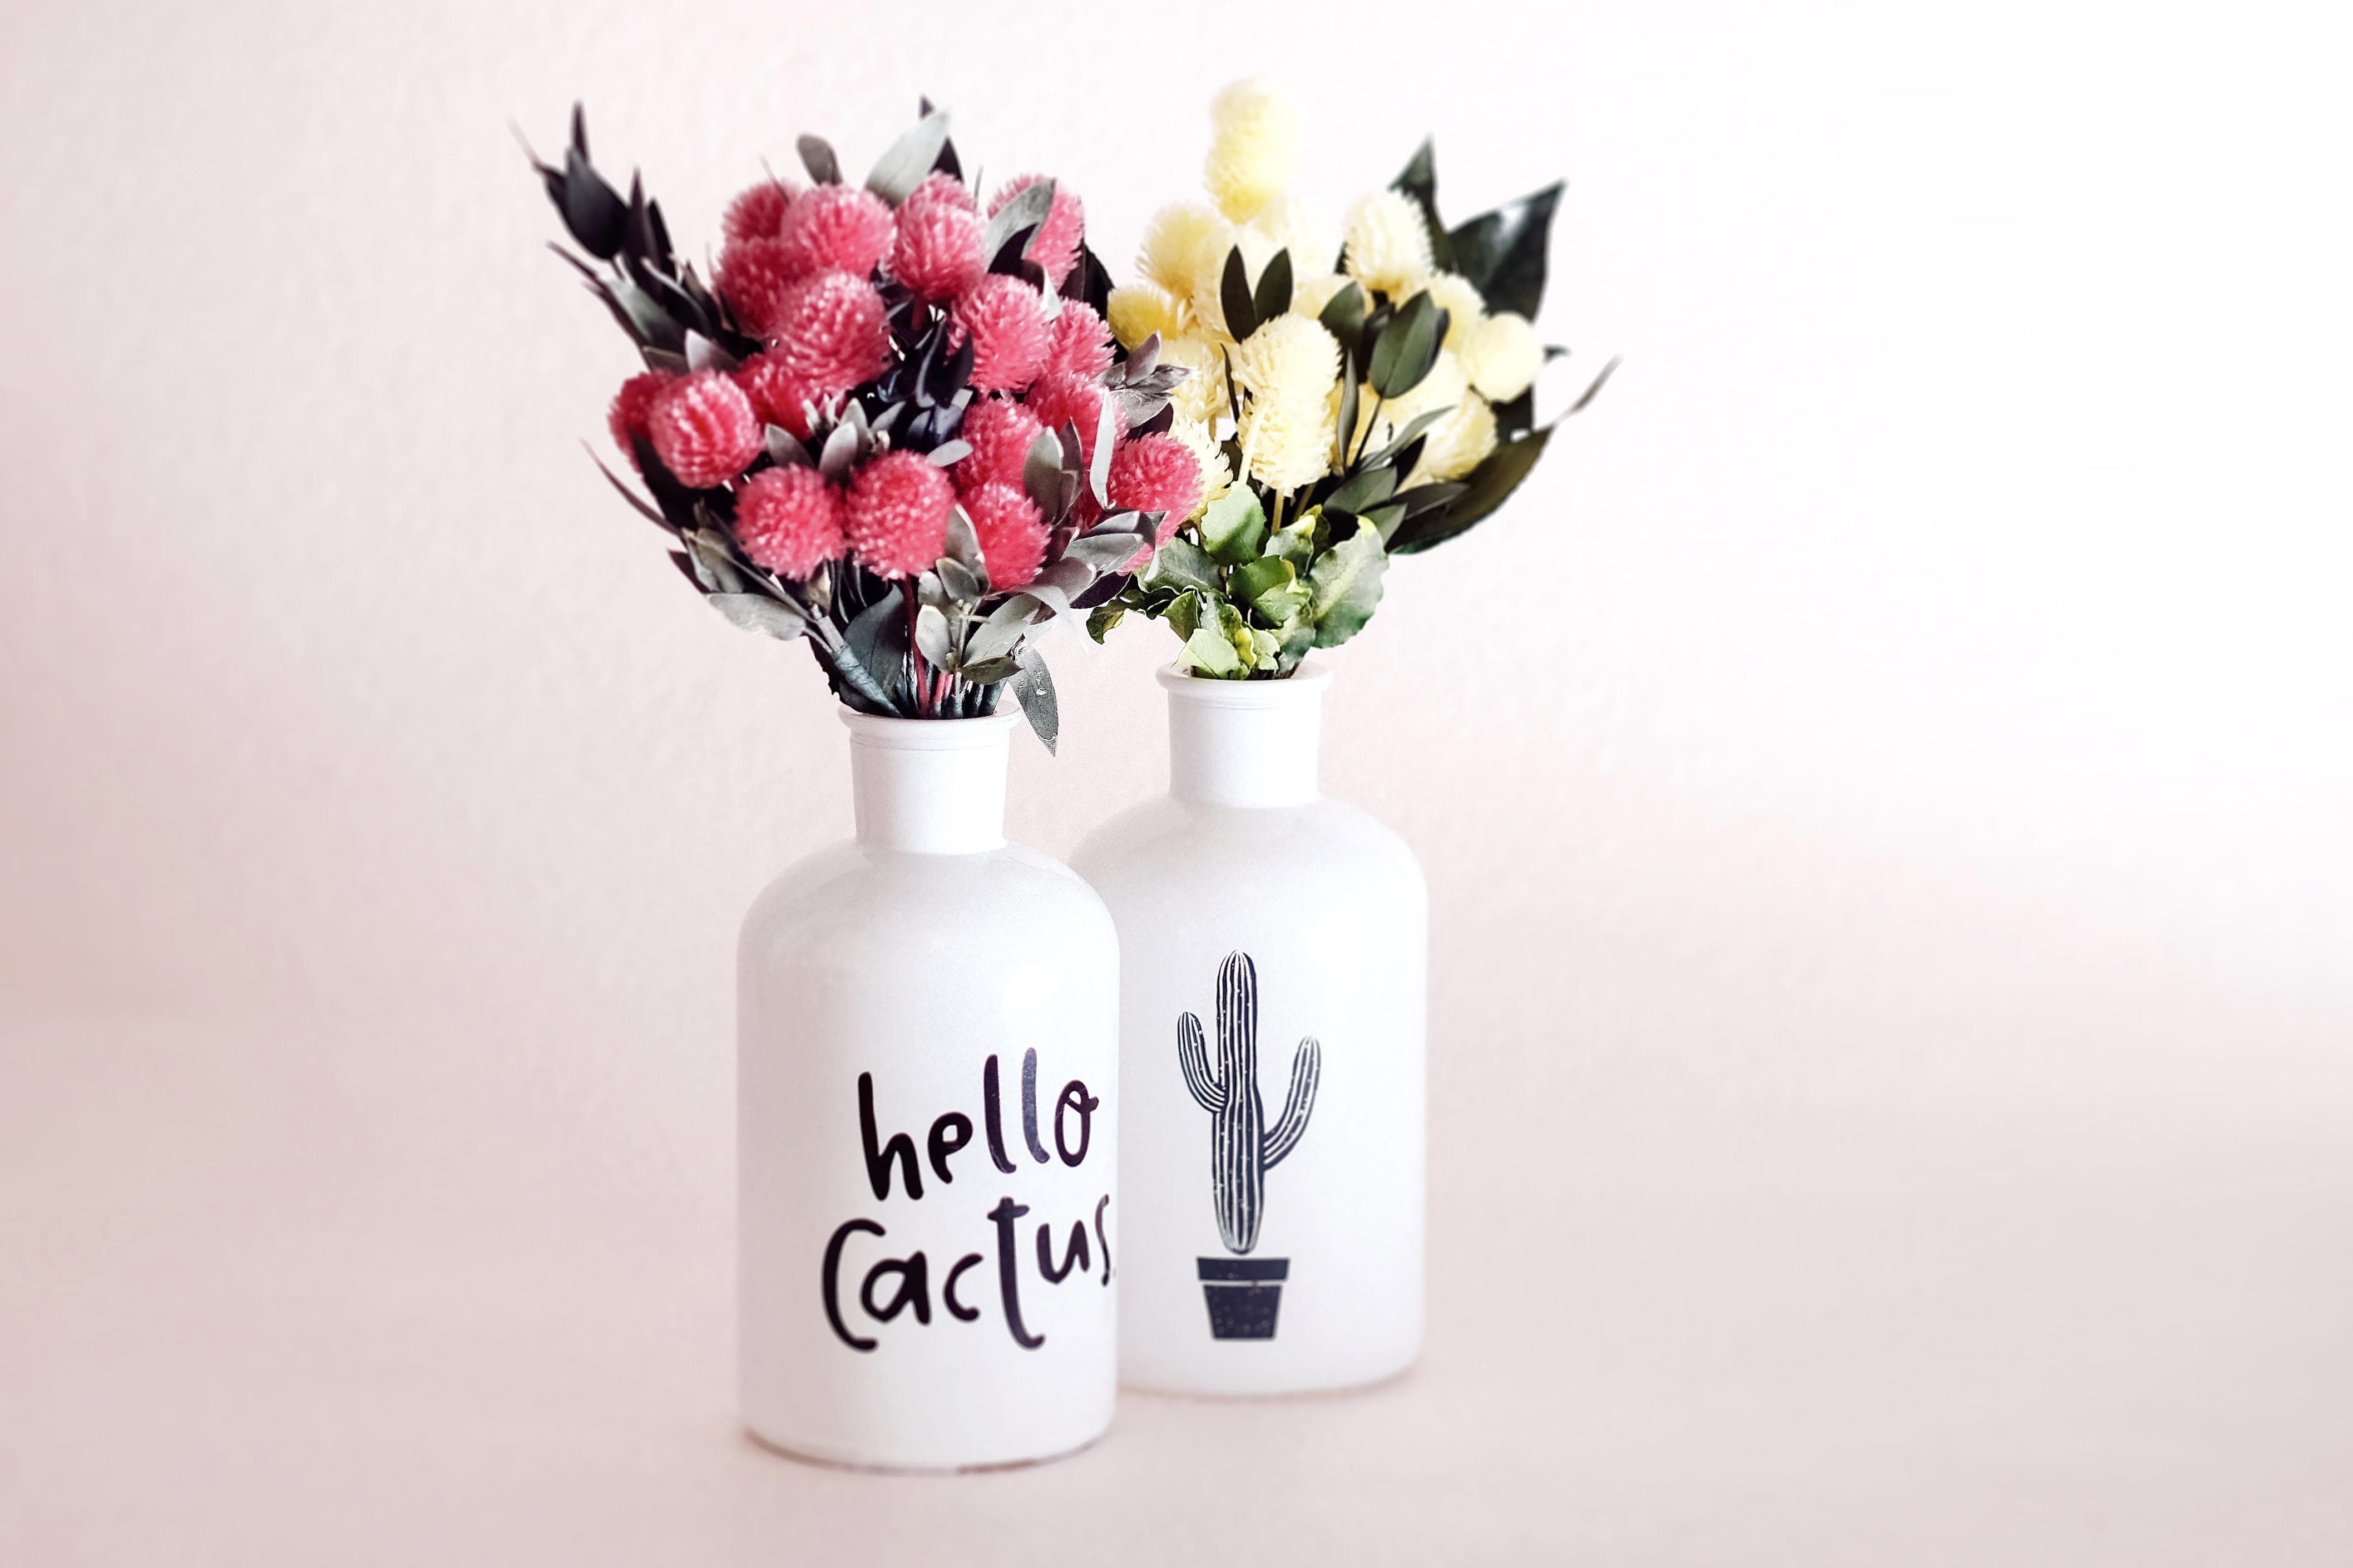 assorted flowers in white ceramic vases